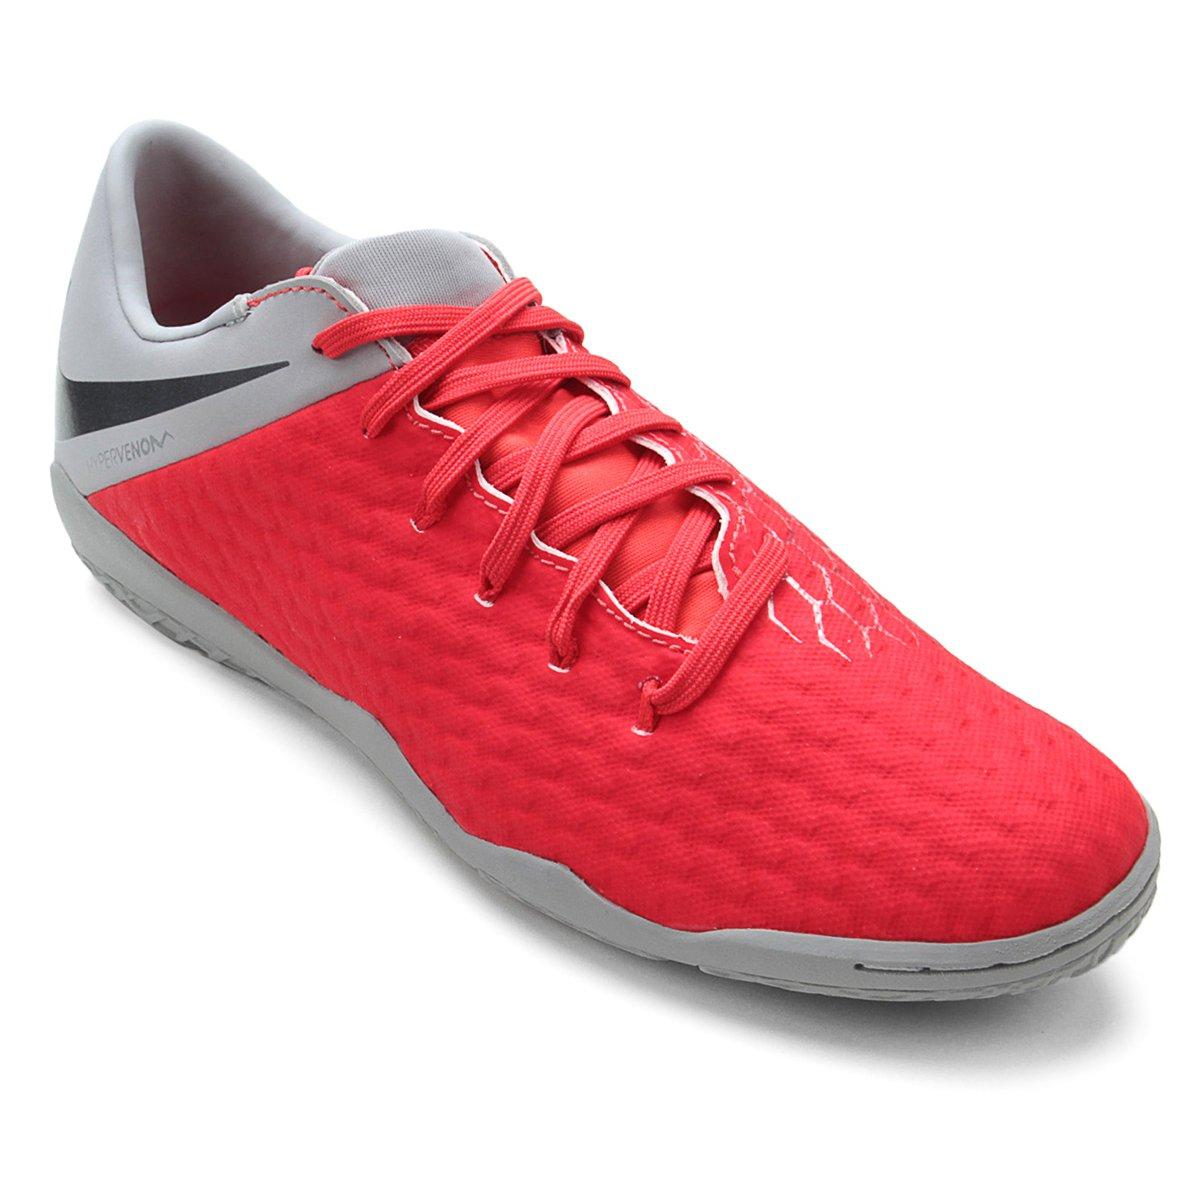 fd1235d08a Chuteira Futsal Nike Hypervenom Phantom 3 Academy IC - Compre Agora ...